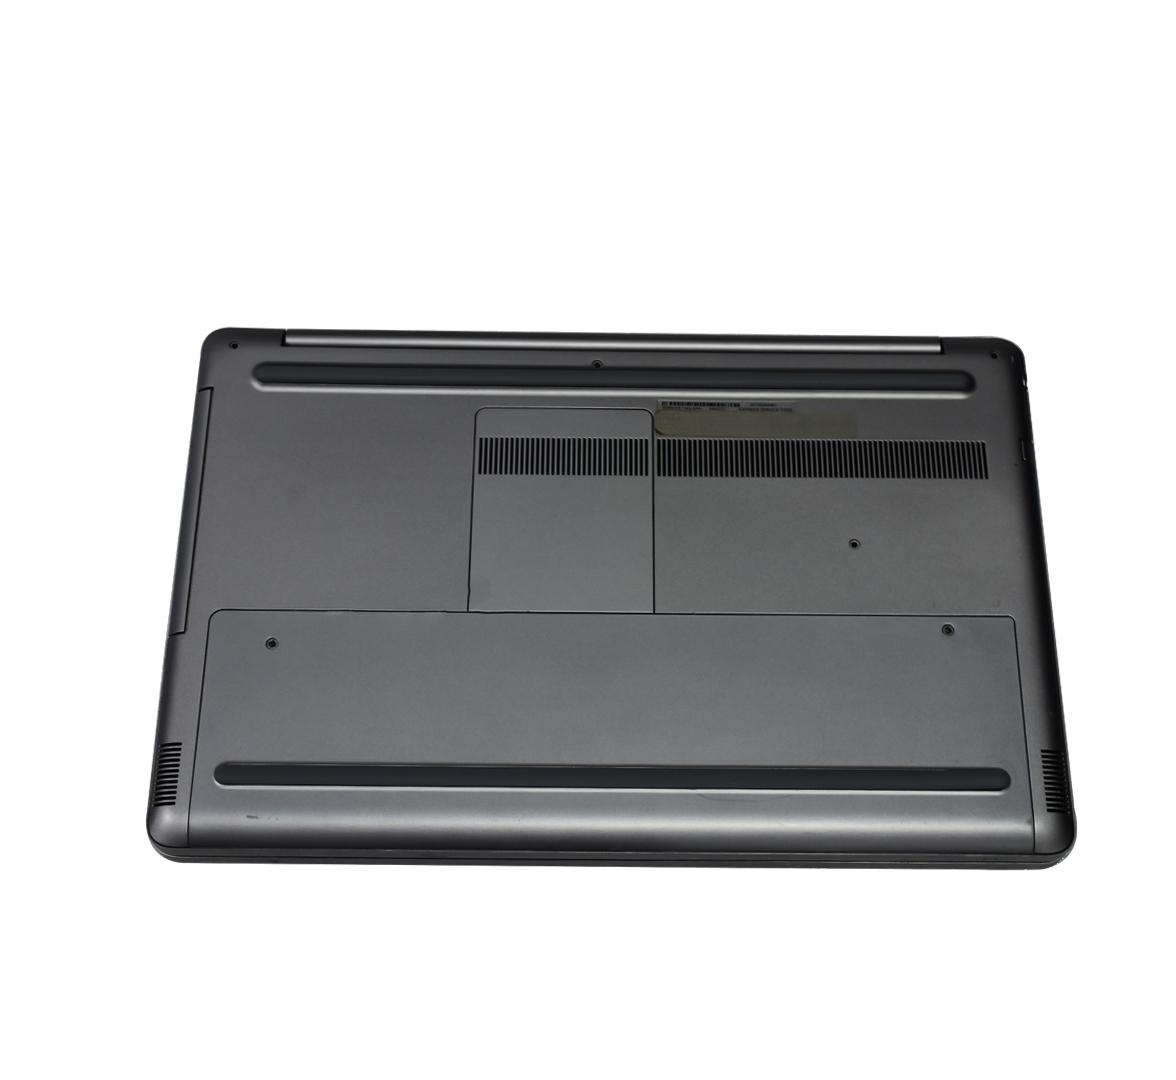 Dell Inspiron 17 7000 series 7737 Business Laptop, Intel Core i7-4500U CPU, 8GB DDR3L SODIMM RAM, 256GB SSD 2.5, 17 inch Touch Display, Windows 10 Pro (Refurbished)